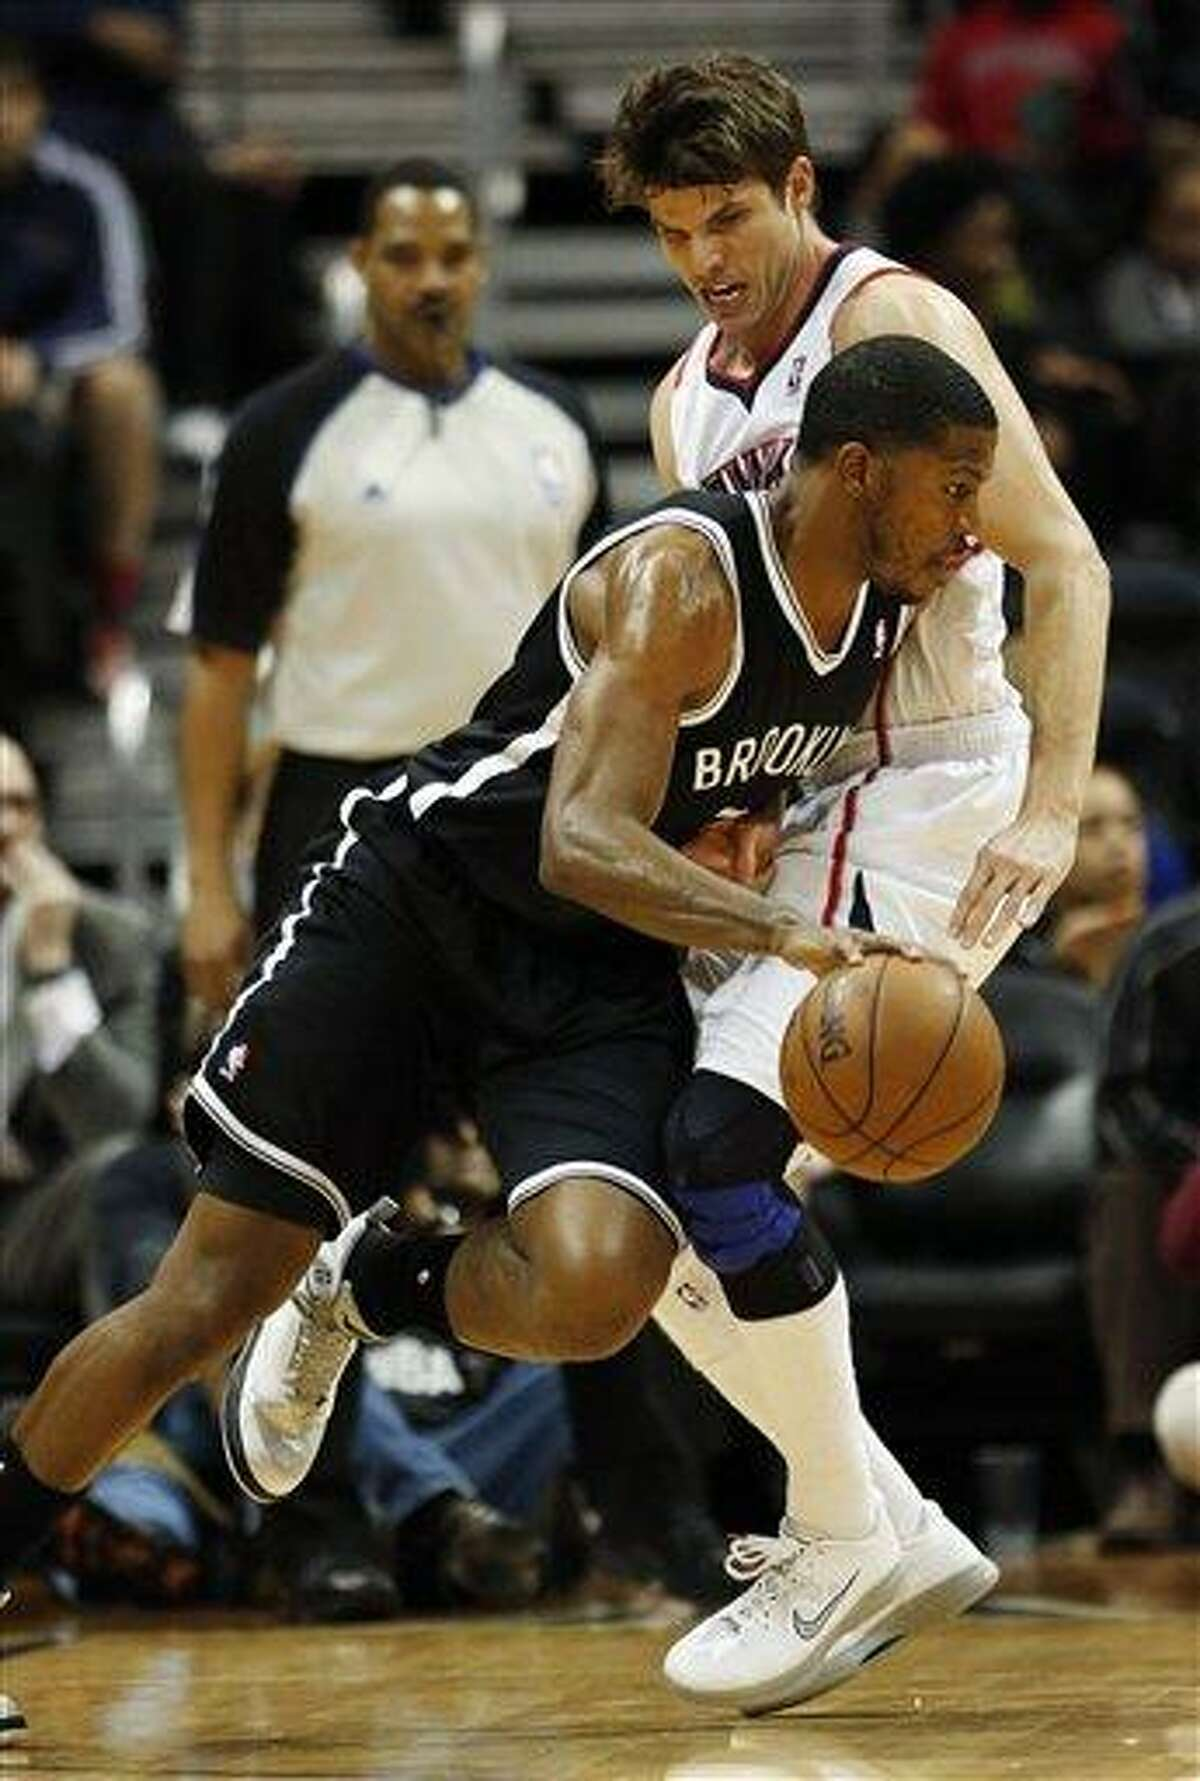 Brooklyn Nets shooting guard Joe Johnson, foreground, drvies against Atlanta Hawks shooting guard Kyle Korver in the first half of an NBA basketball game on Wednesday, Jan. 16, 2013, in Atlanta. (AP Photo/John Bazemore)